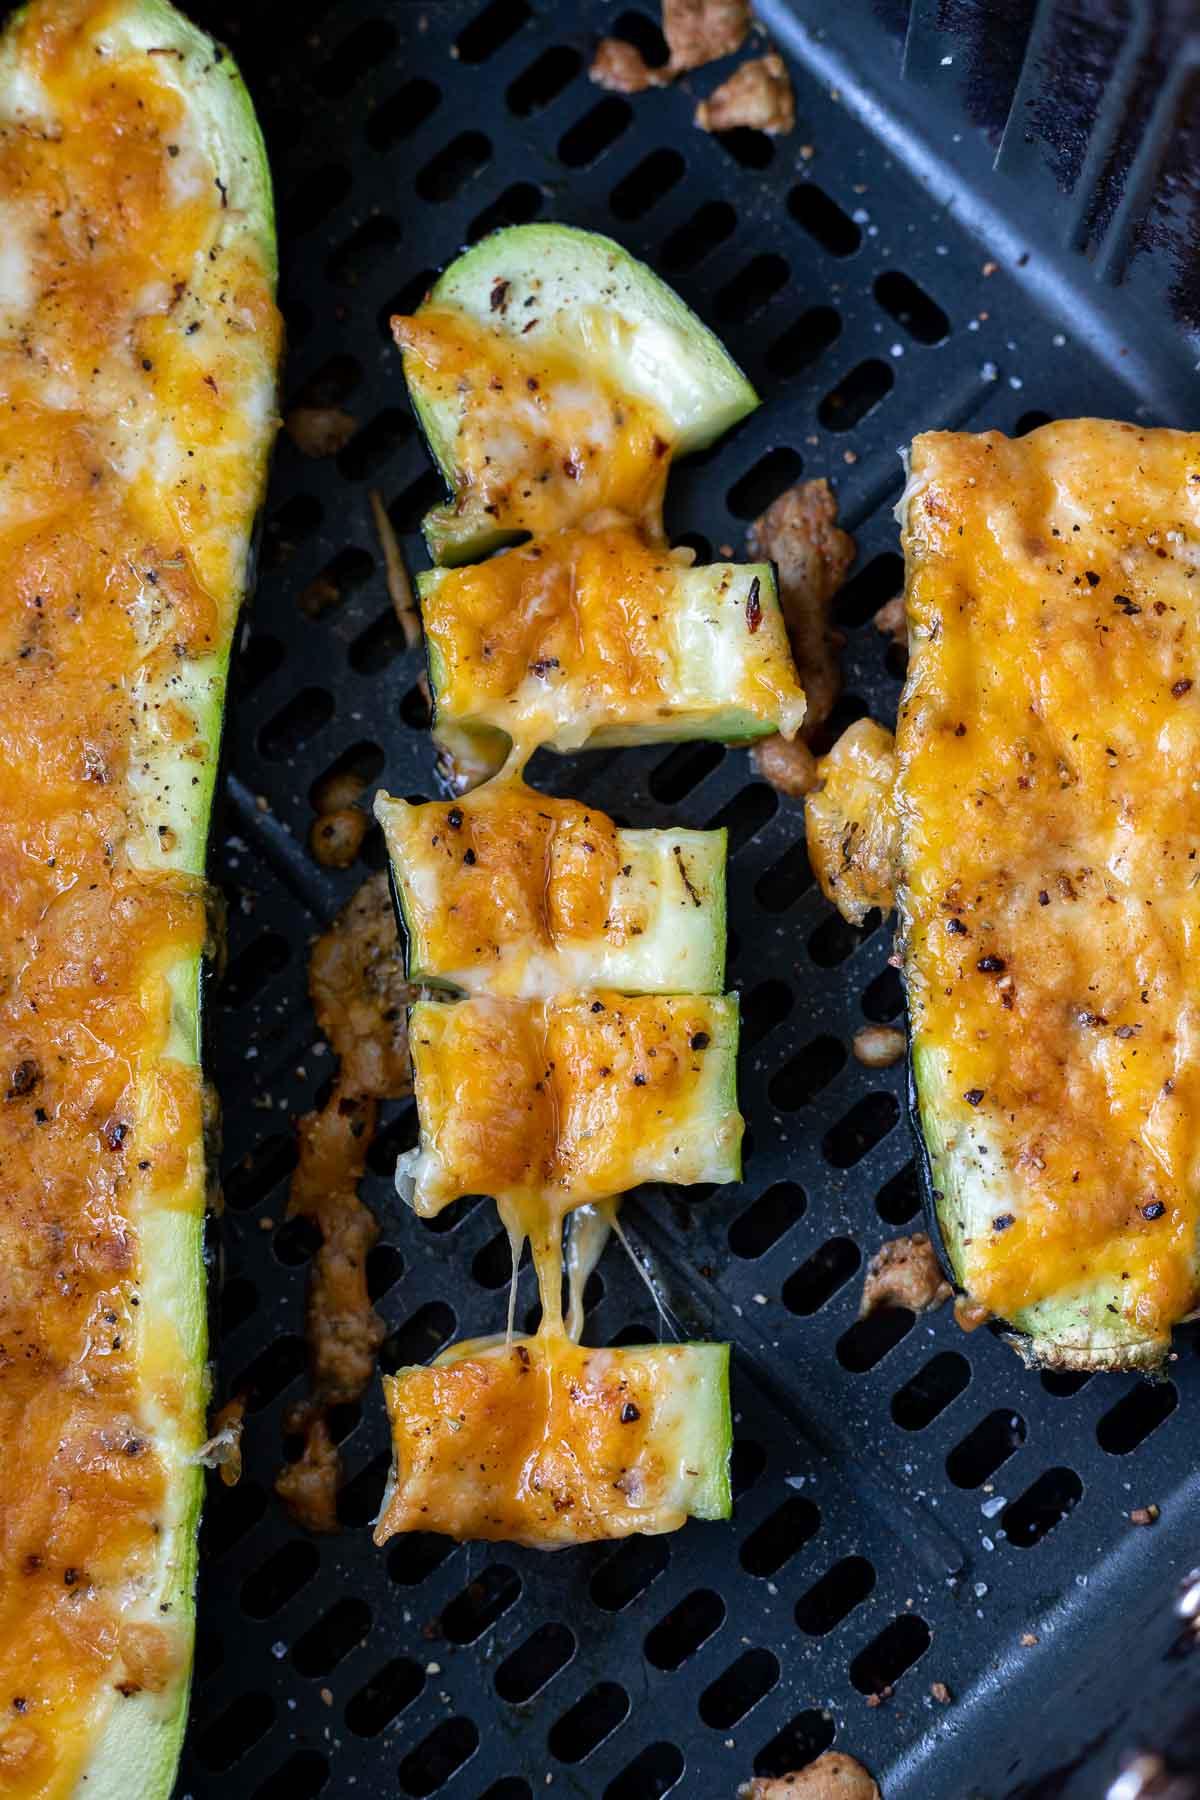 melty cheesy zucchini in air fryer basket